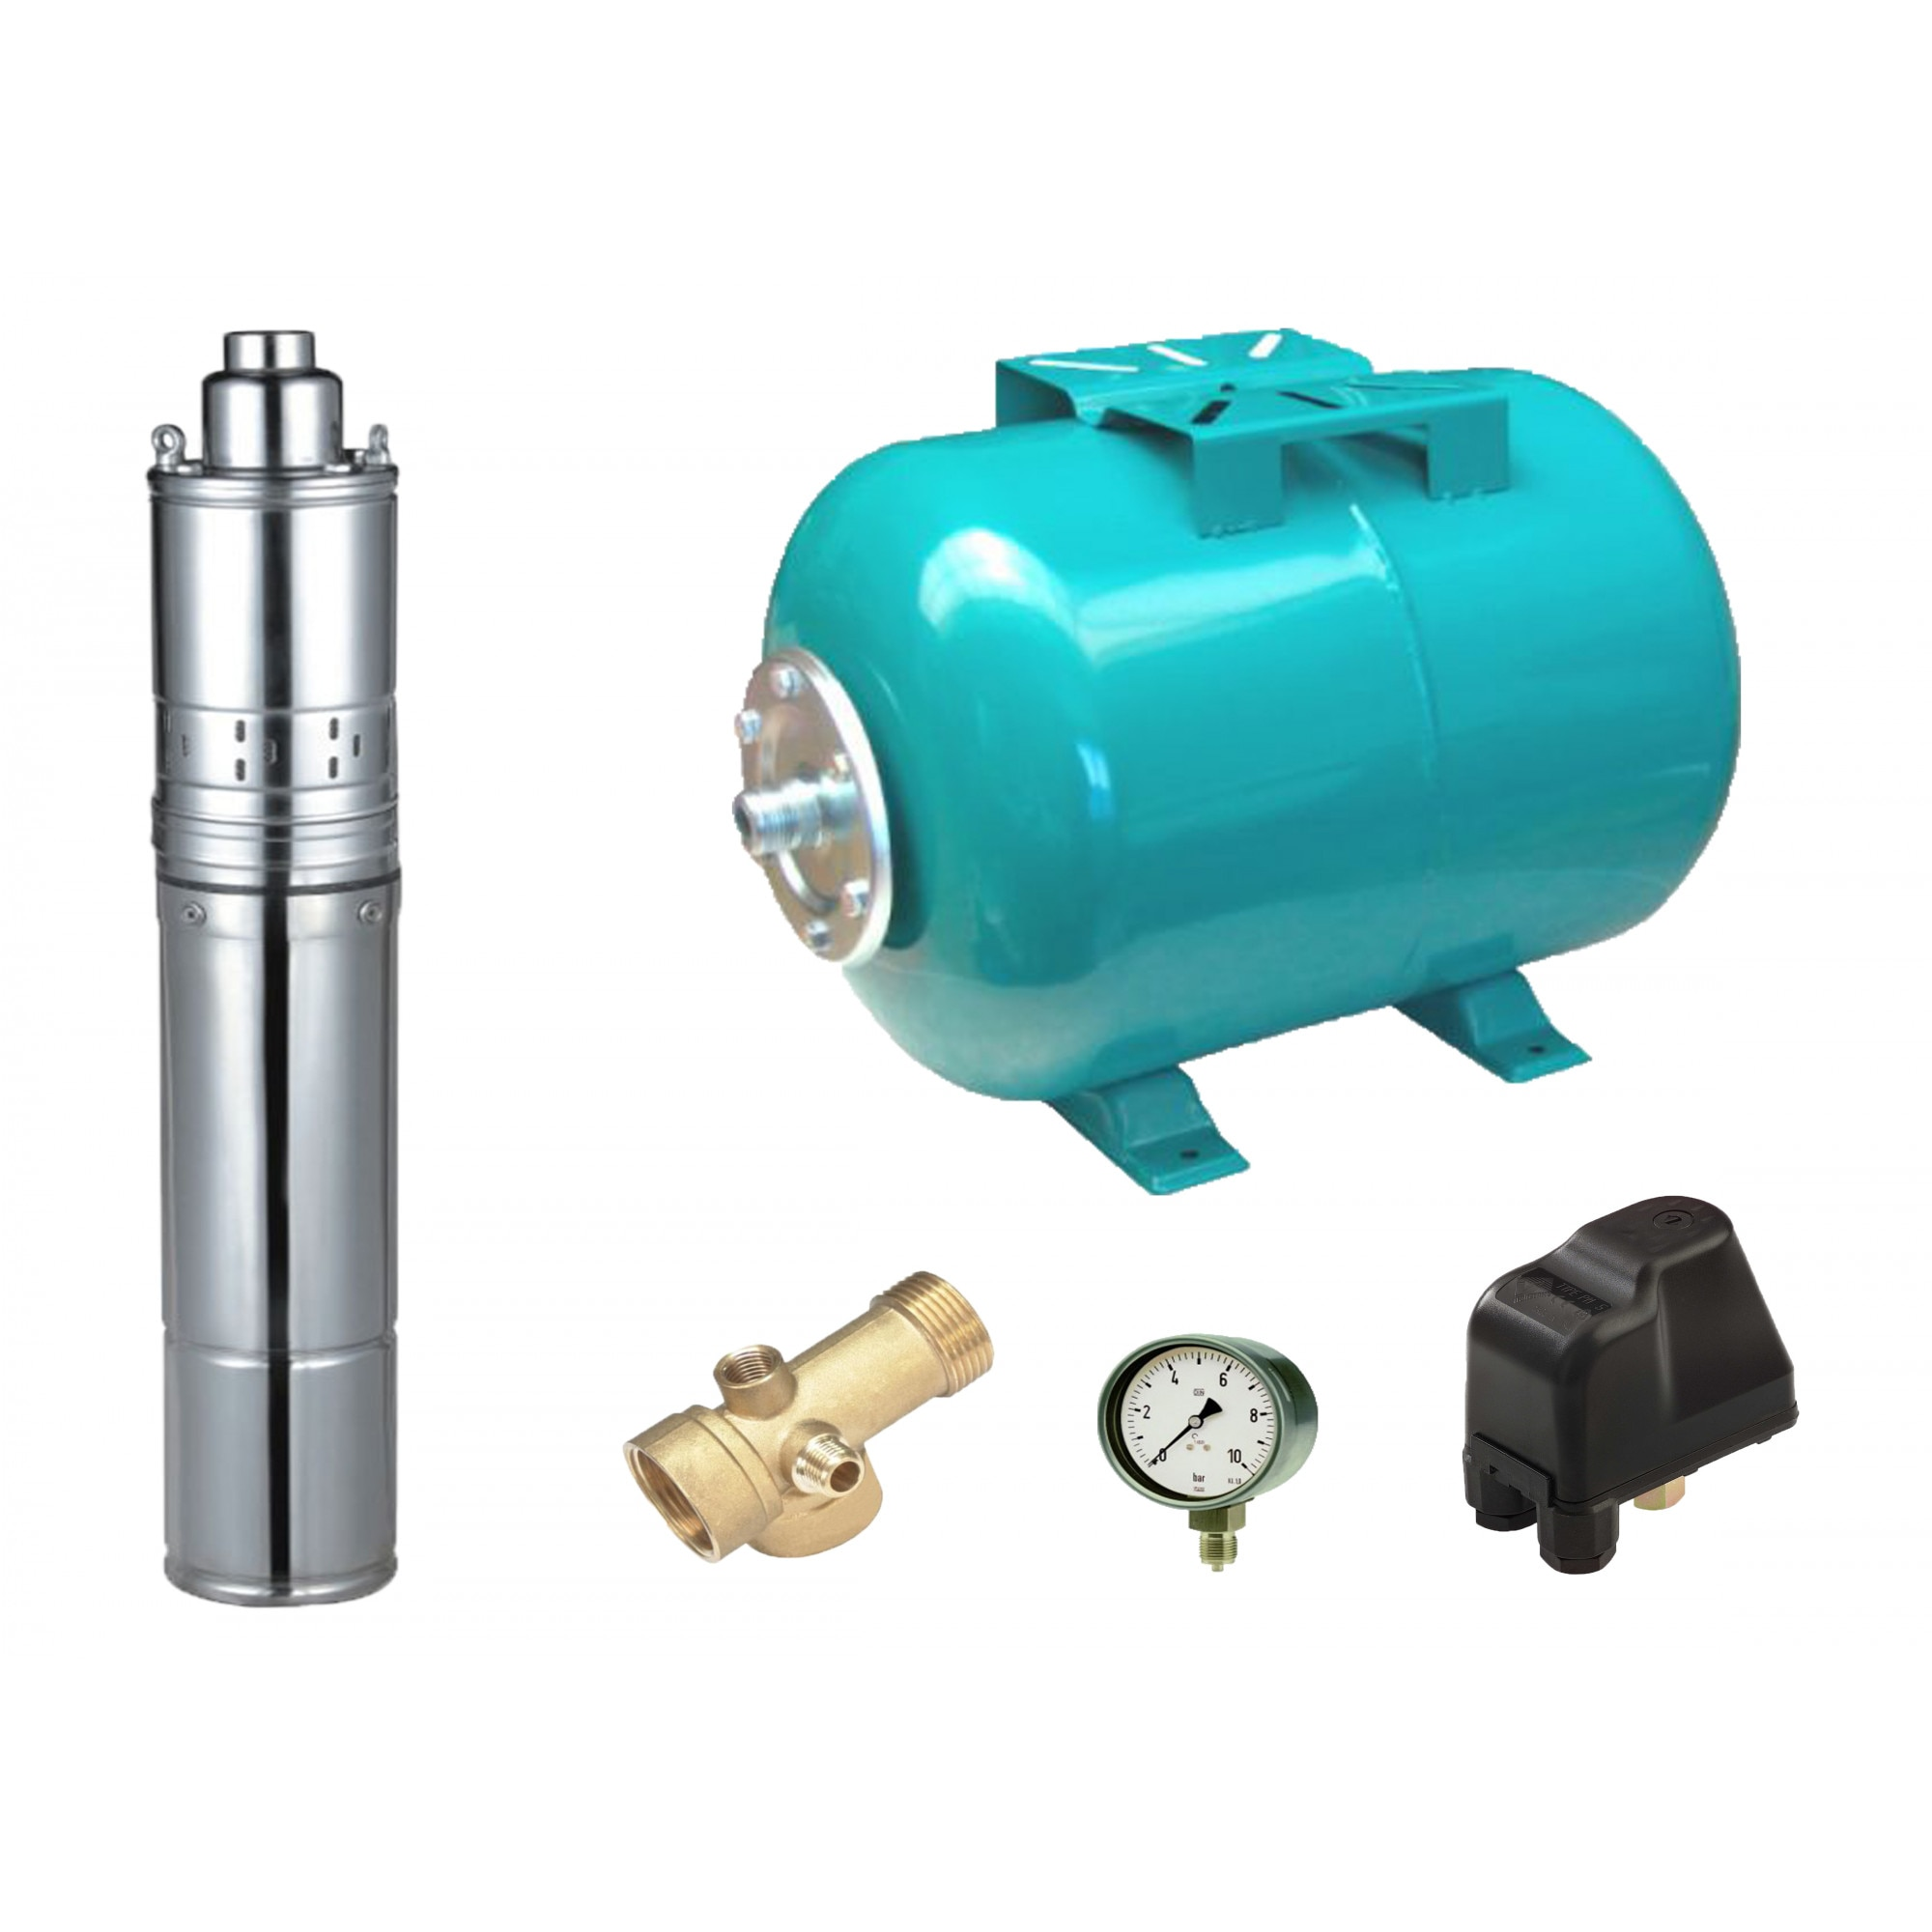 Fotografie Kit complet sistem hidrofor, pompa submersibila apa curata cu surub Maxima 03034020/50, rezervor de 50 litri, presostat, racord 5 cai, manometru, 370 W, 30 l/min debit maxim